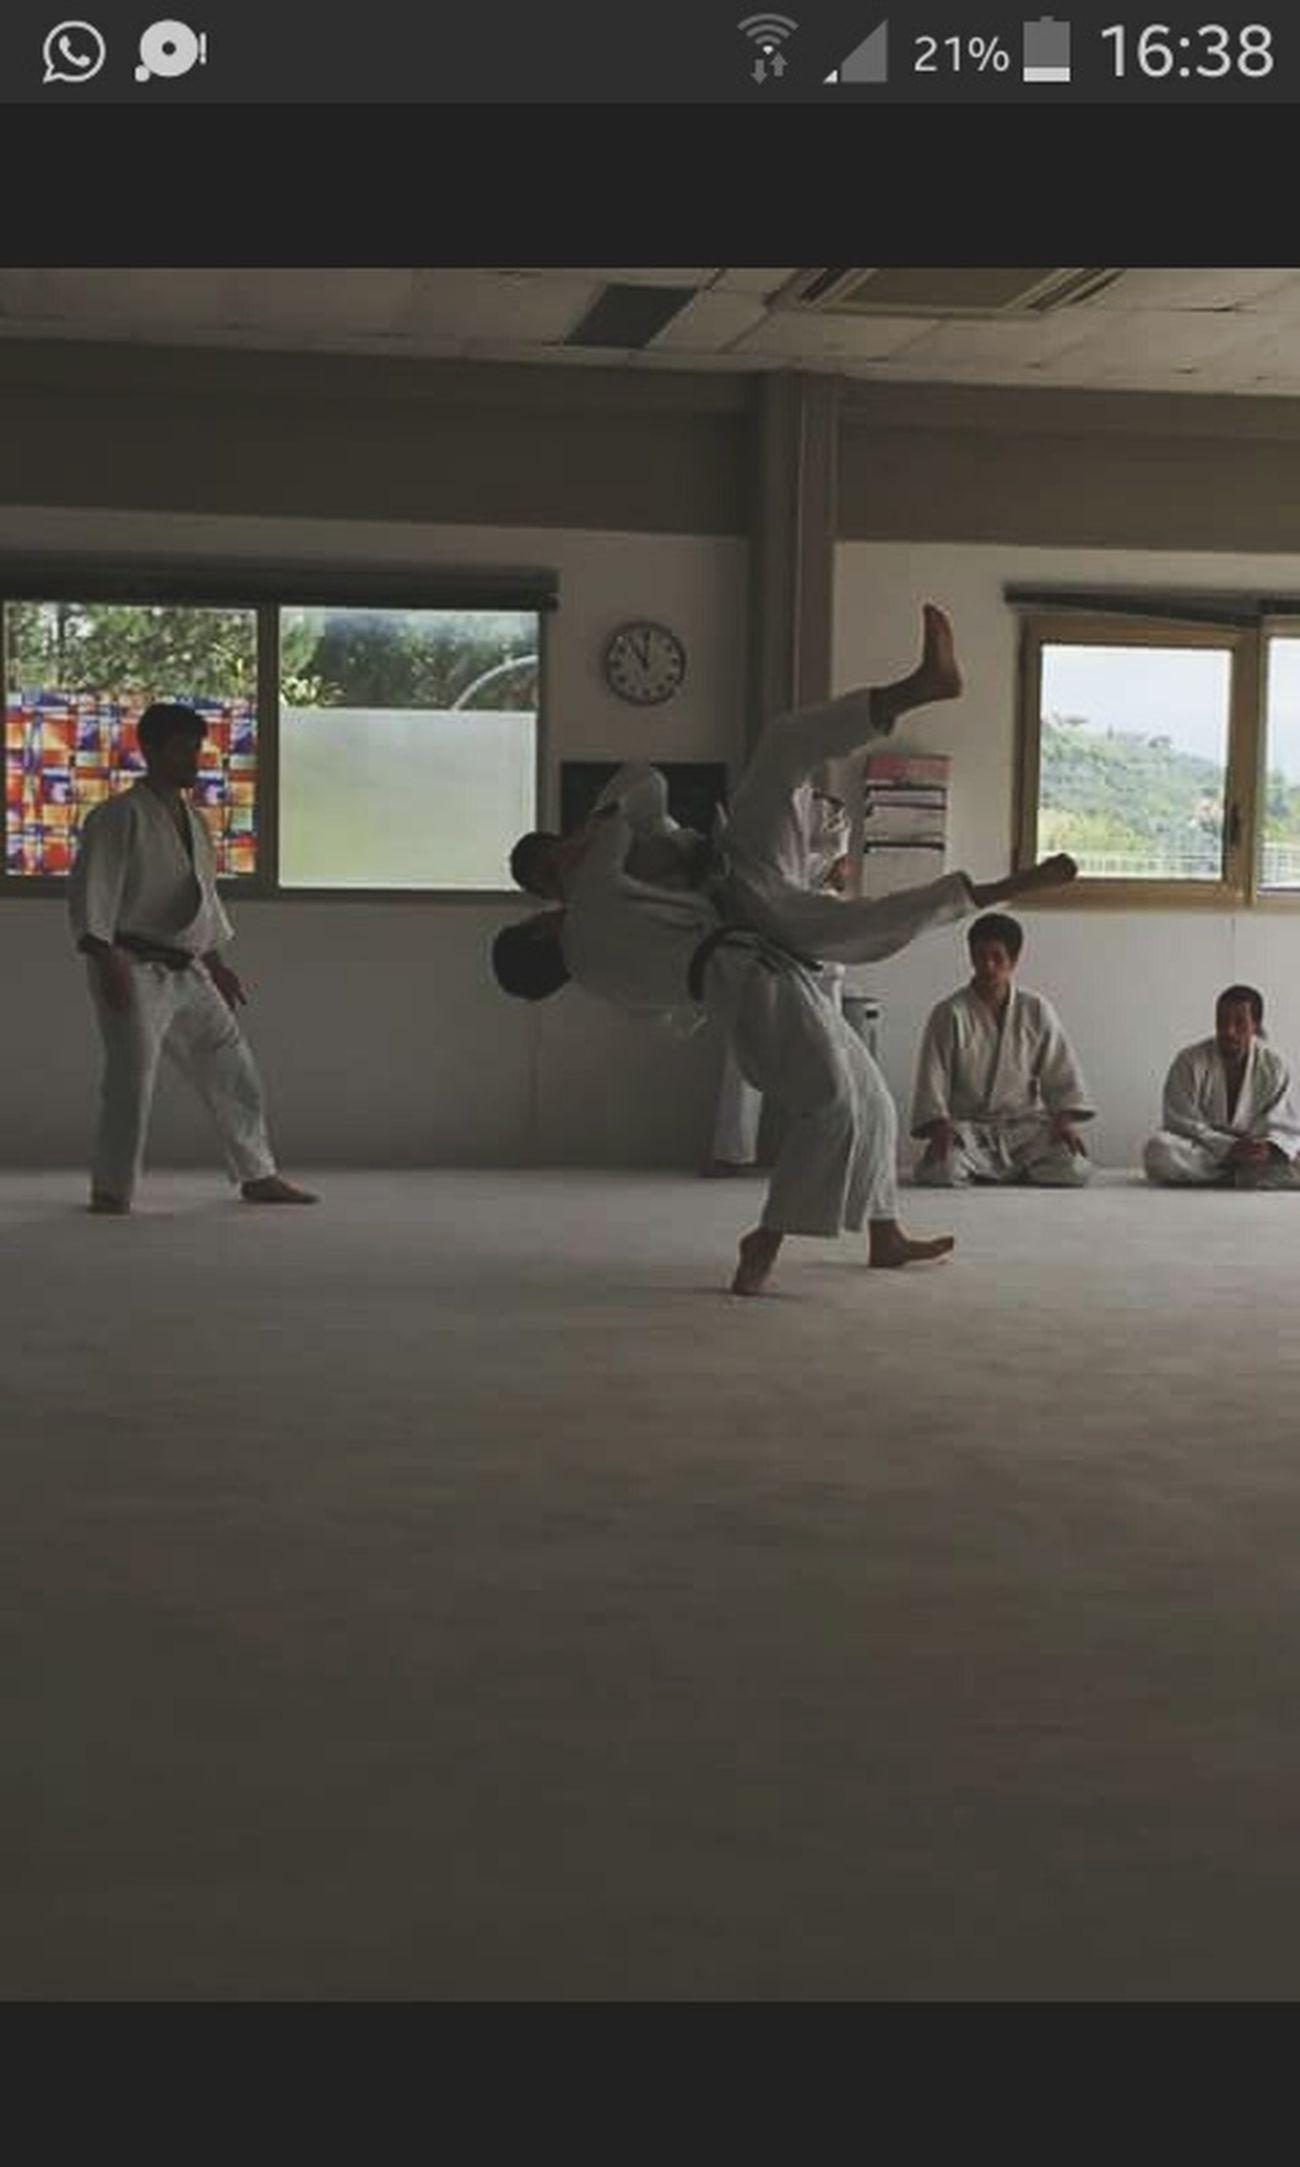 Judo Judoeducazione Gara Ippon Uranage Spettacolare